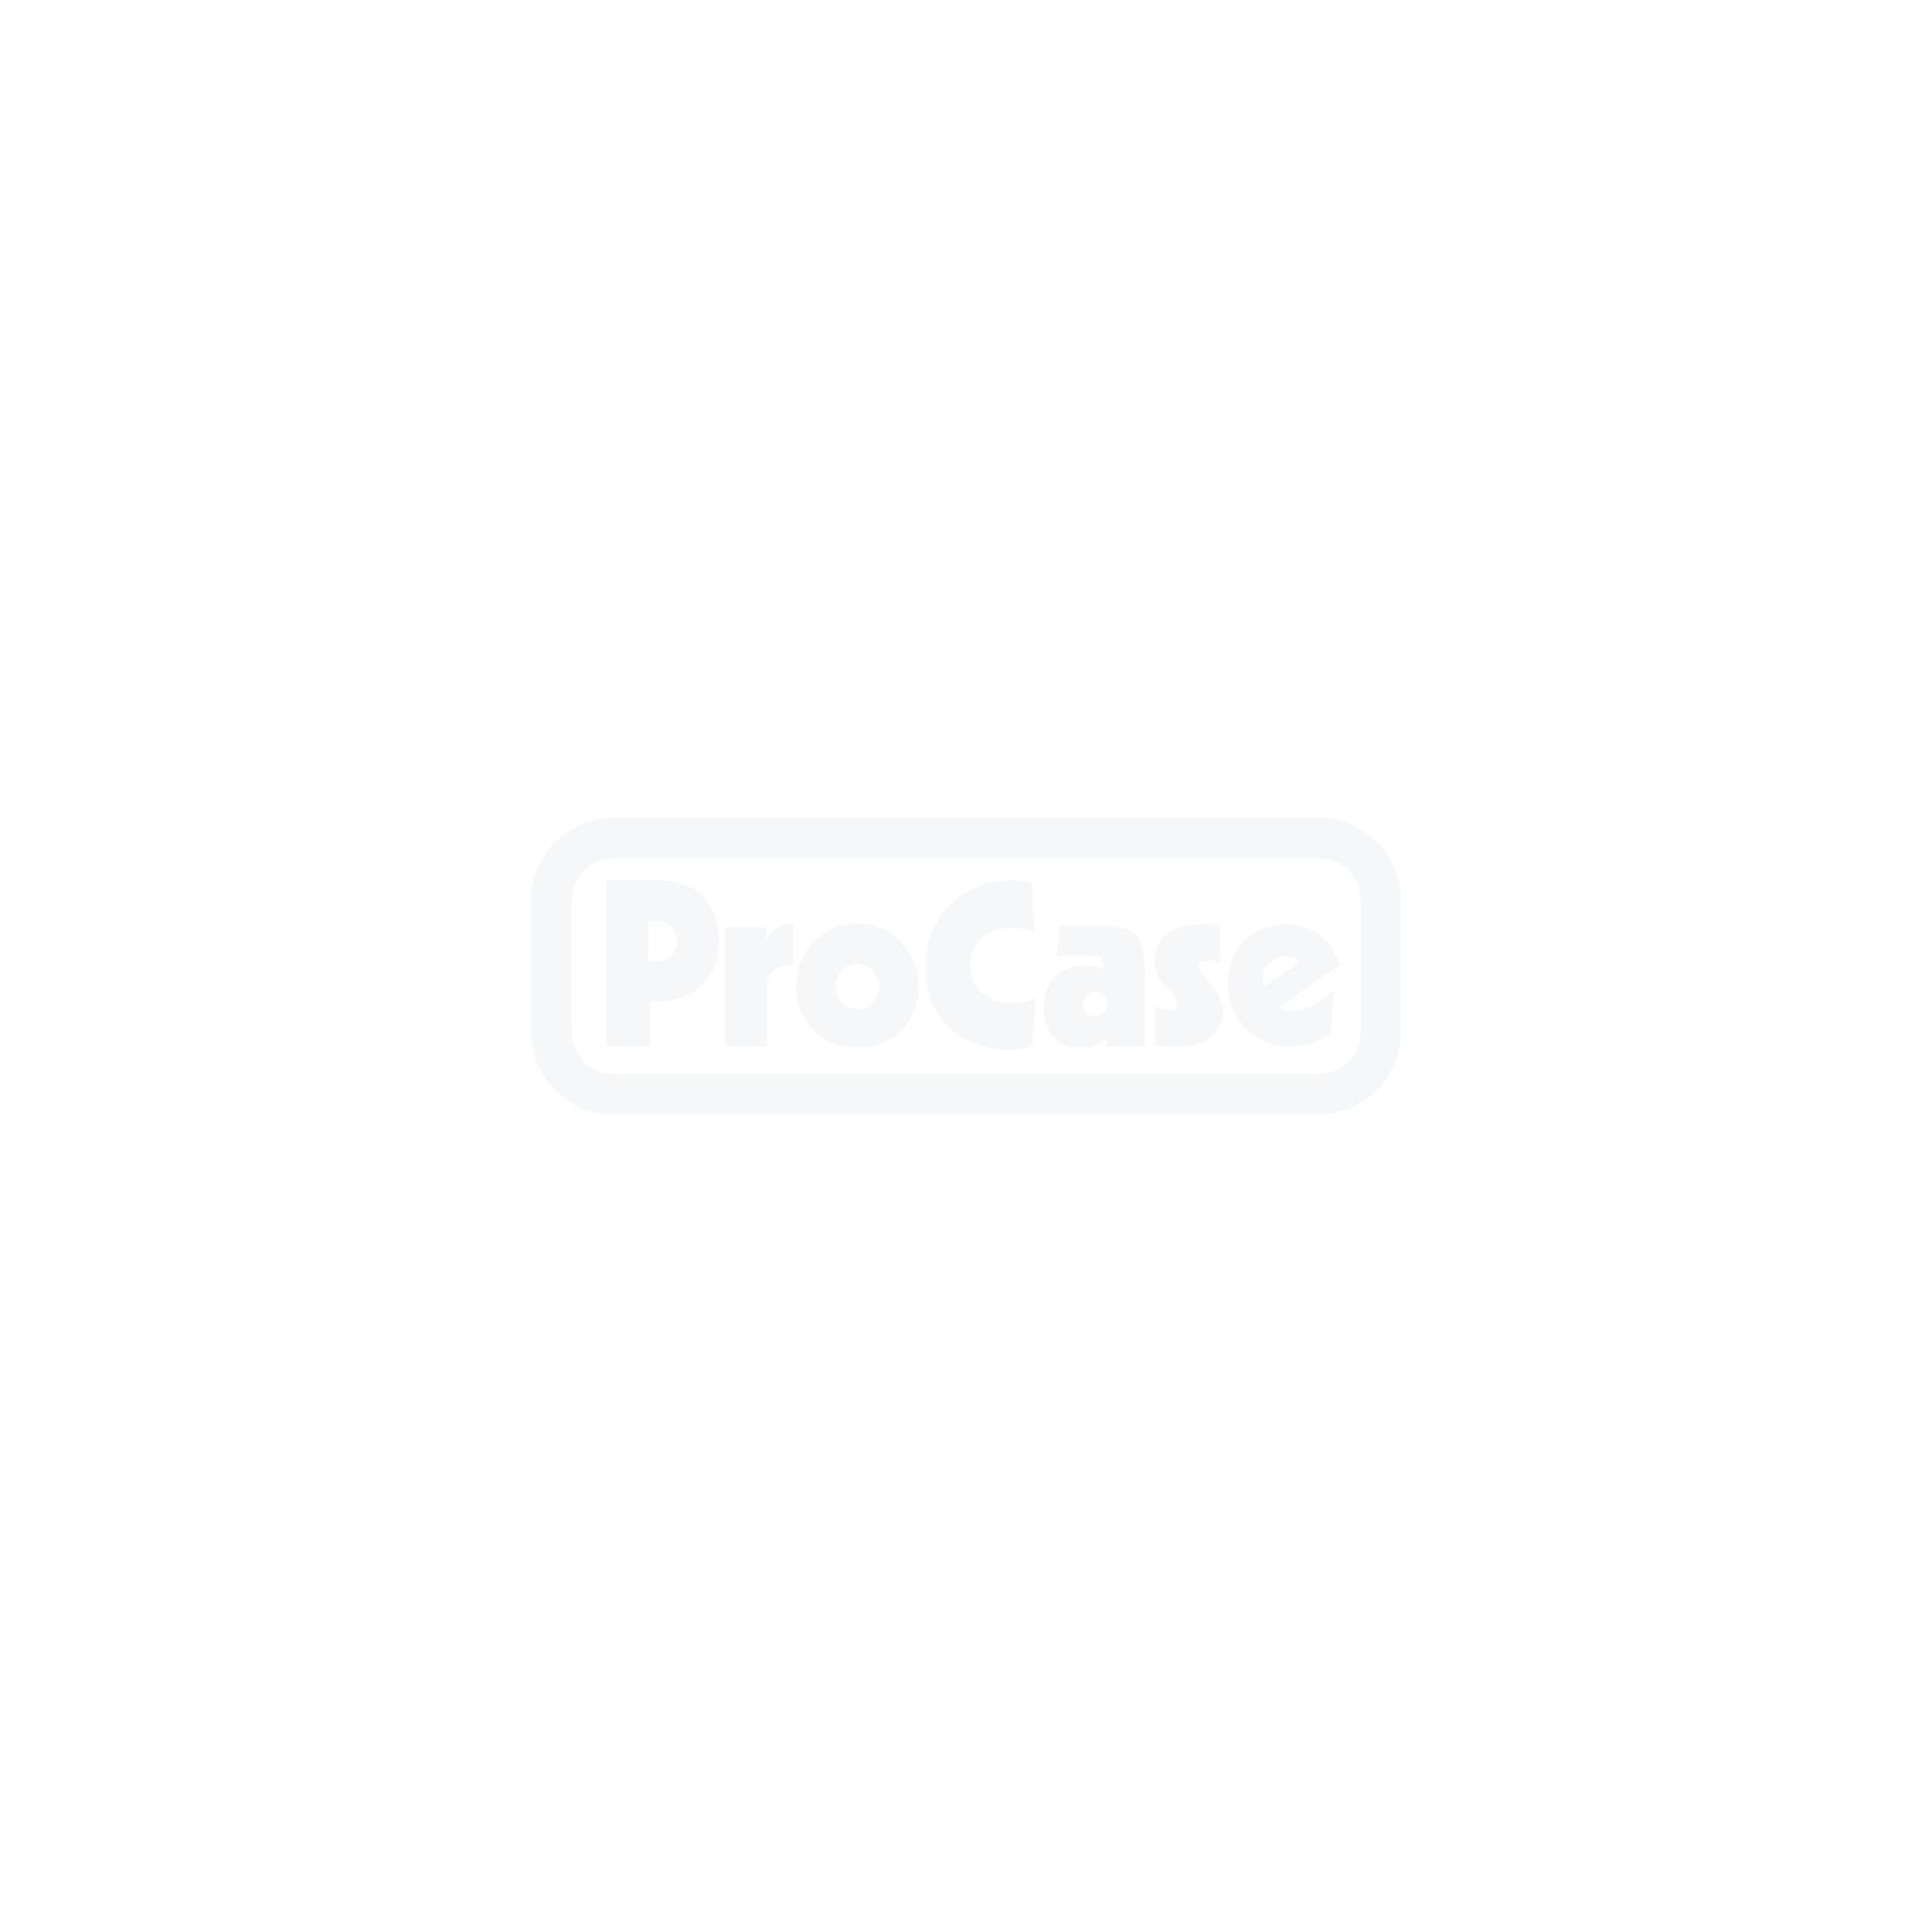 Flightcase für 4x JBLED A7 Zoom / JBLED A4 Zoom 3